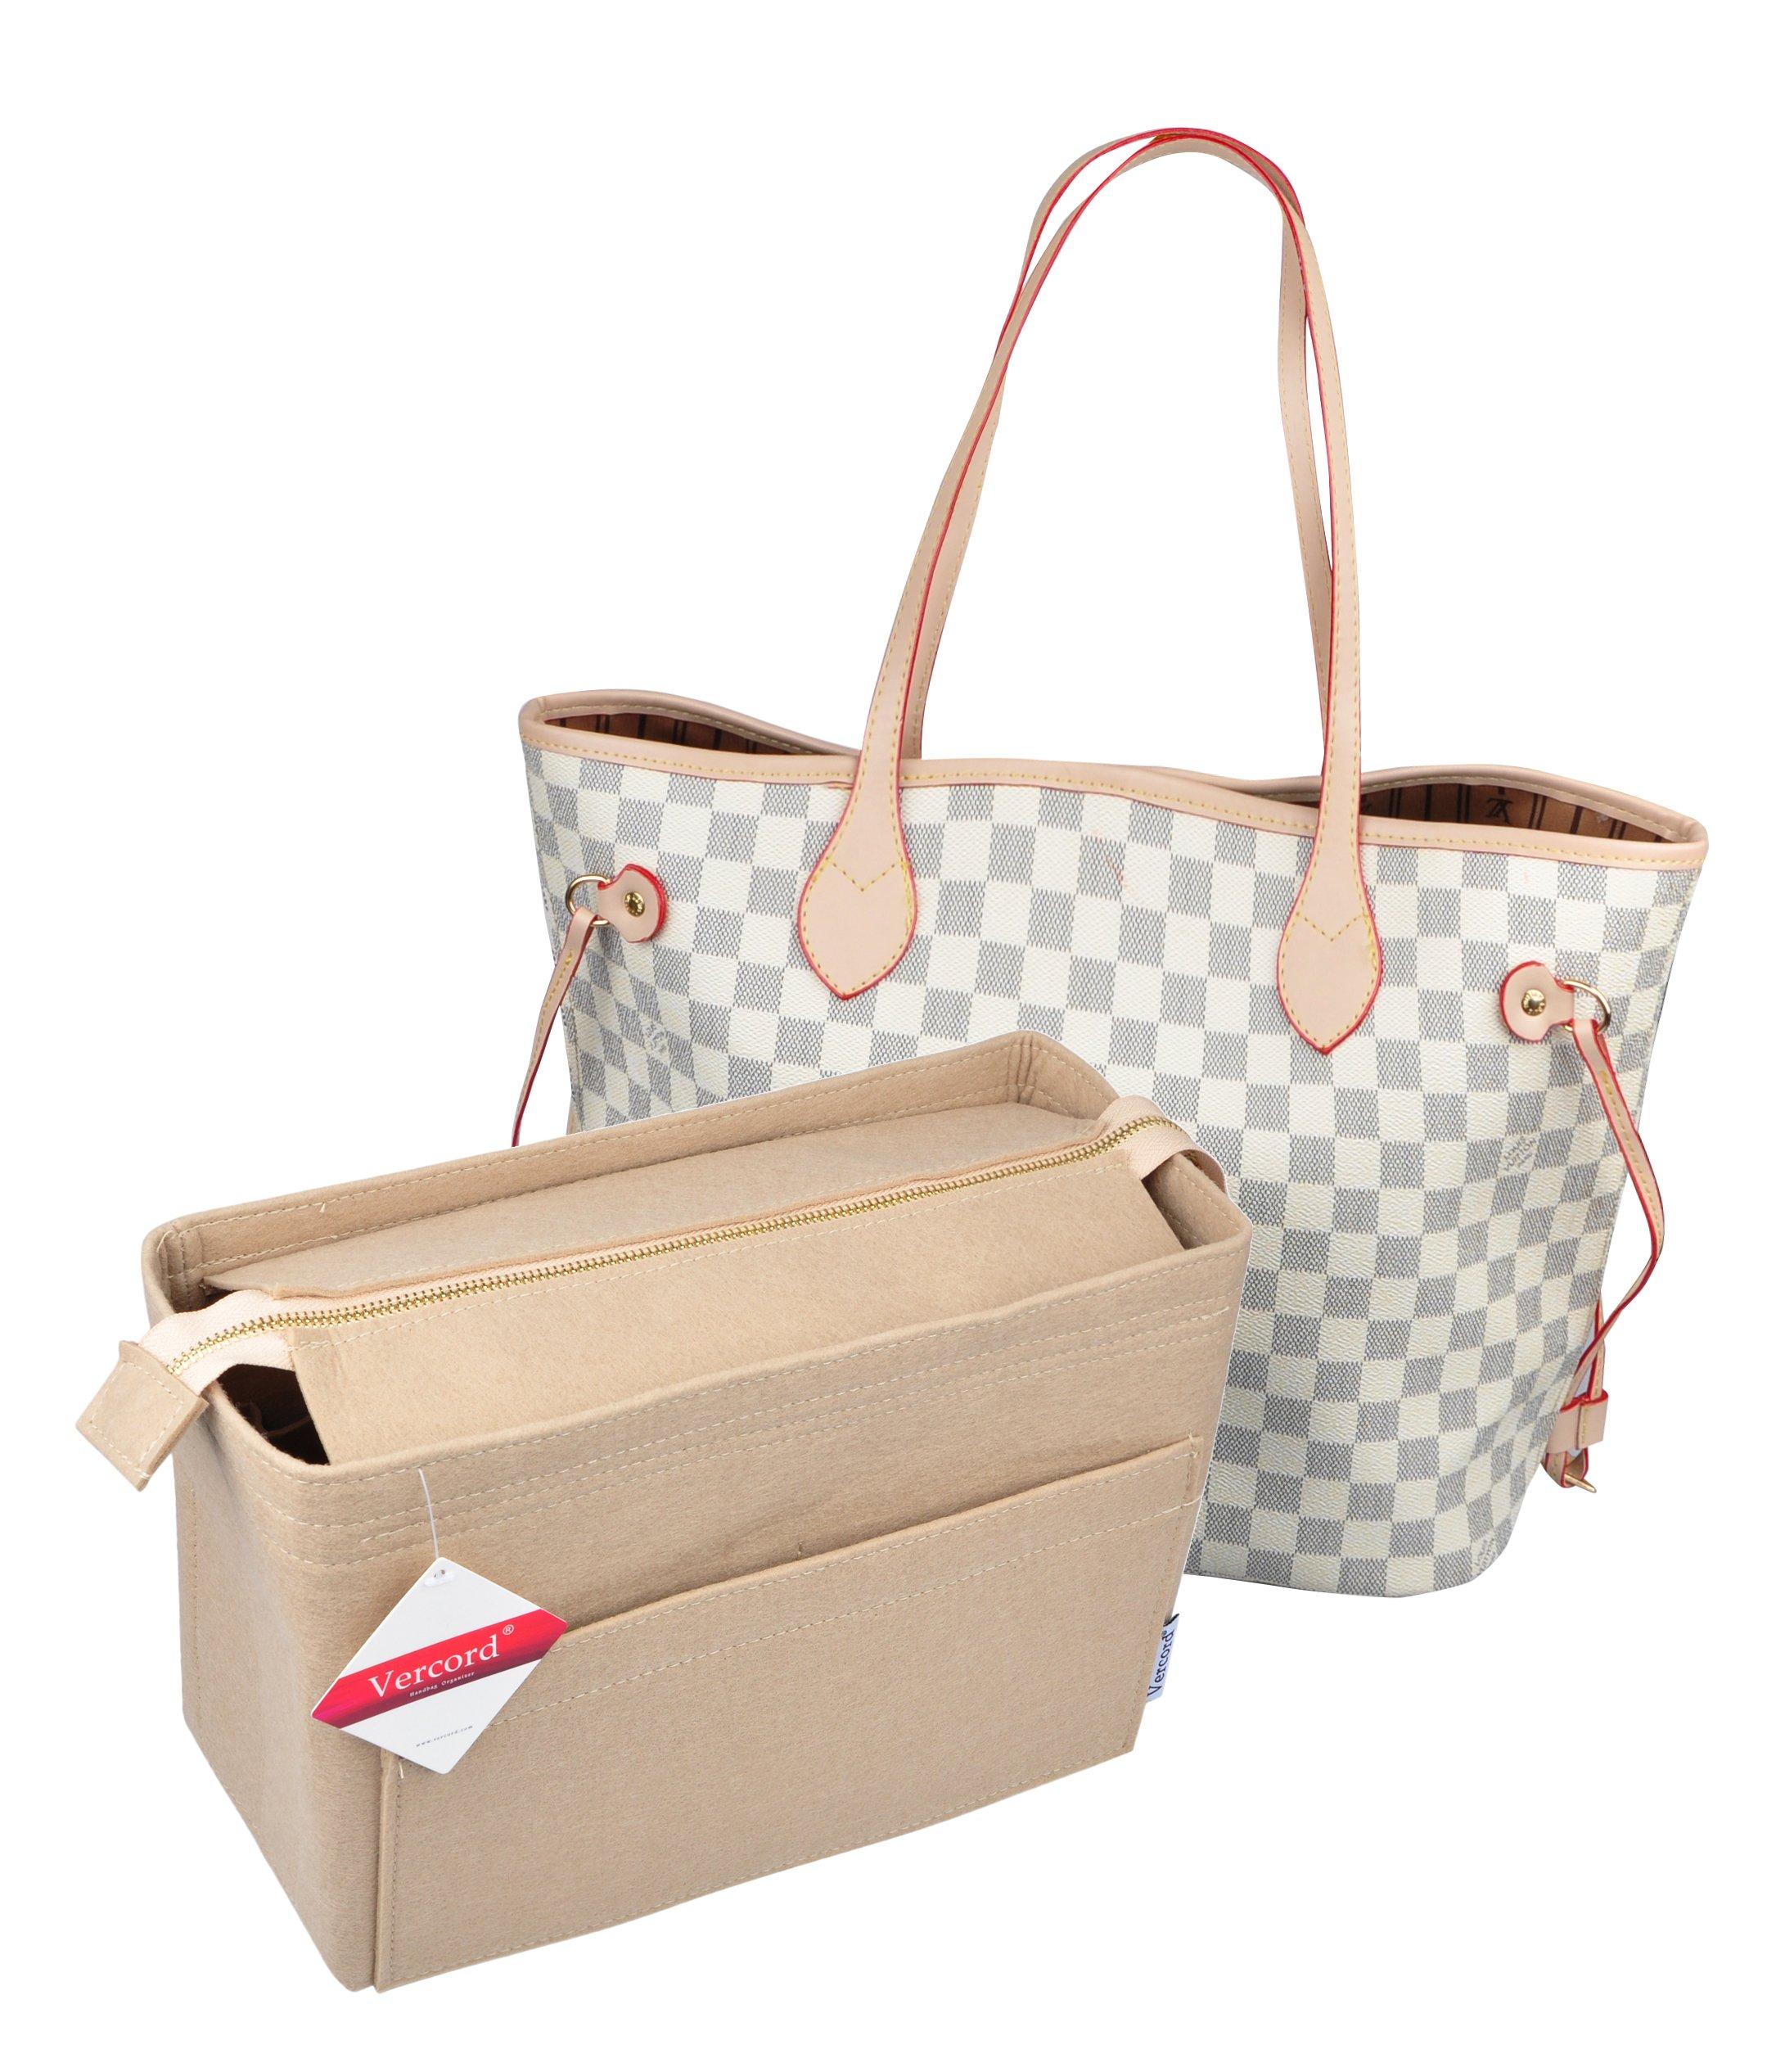 Vercord Large Felt Zipper Handbag Tote Purse Duffel Backpack Organizer Insert 2 Size, Beige L